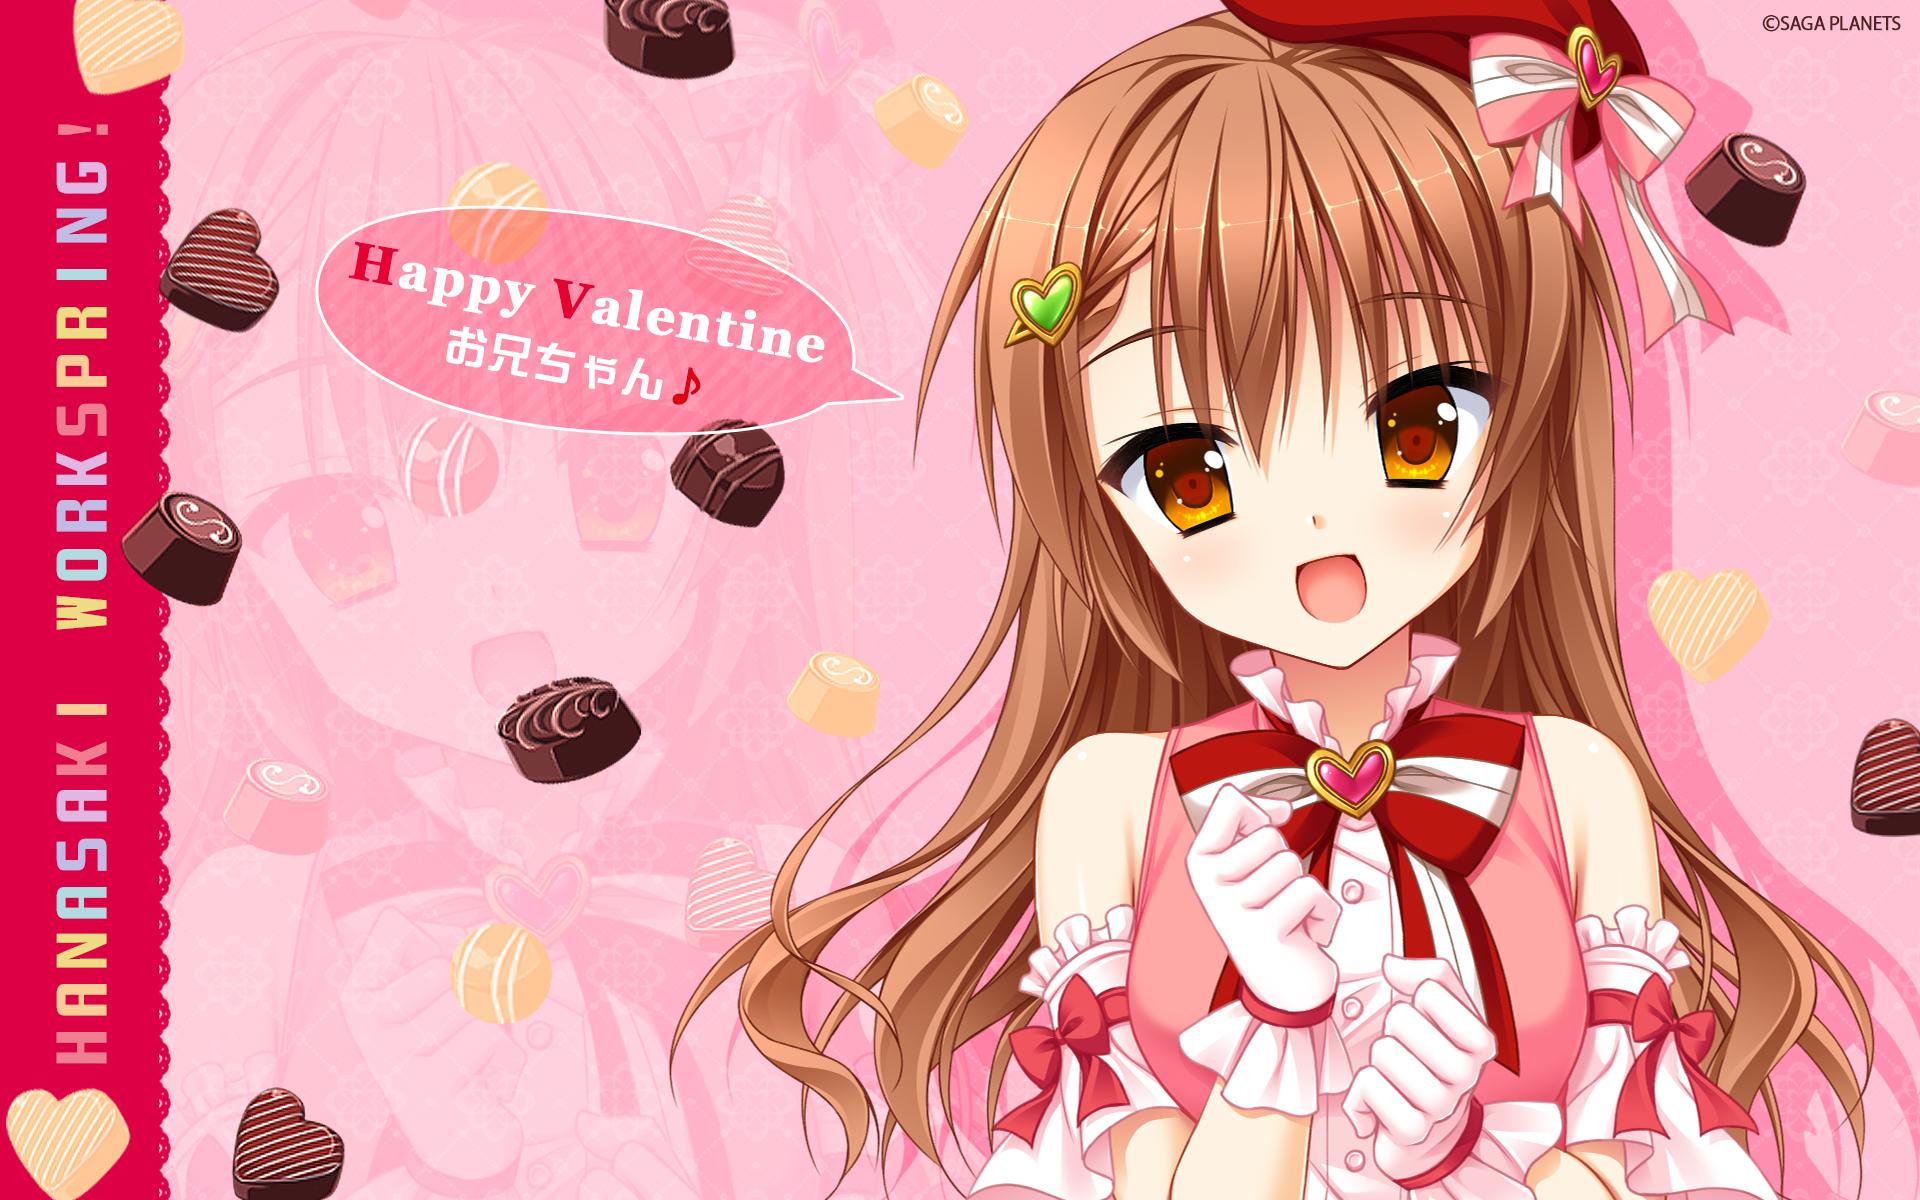 hanasaki_work_spring_12.jpg